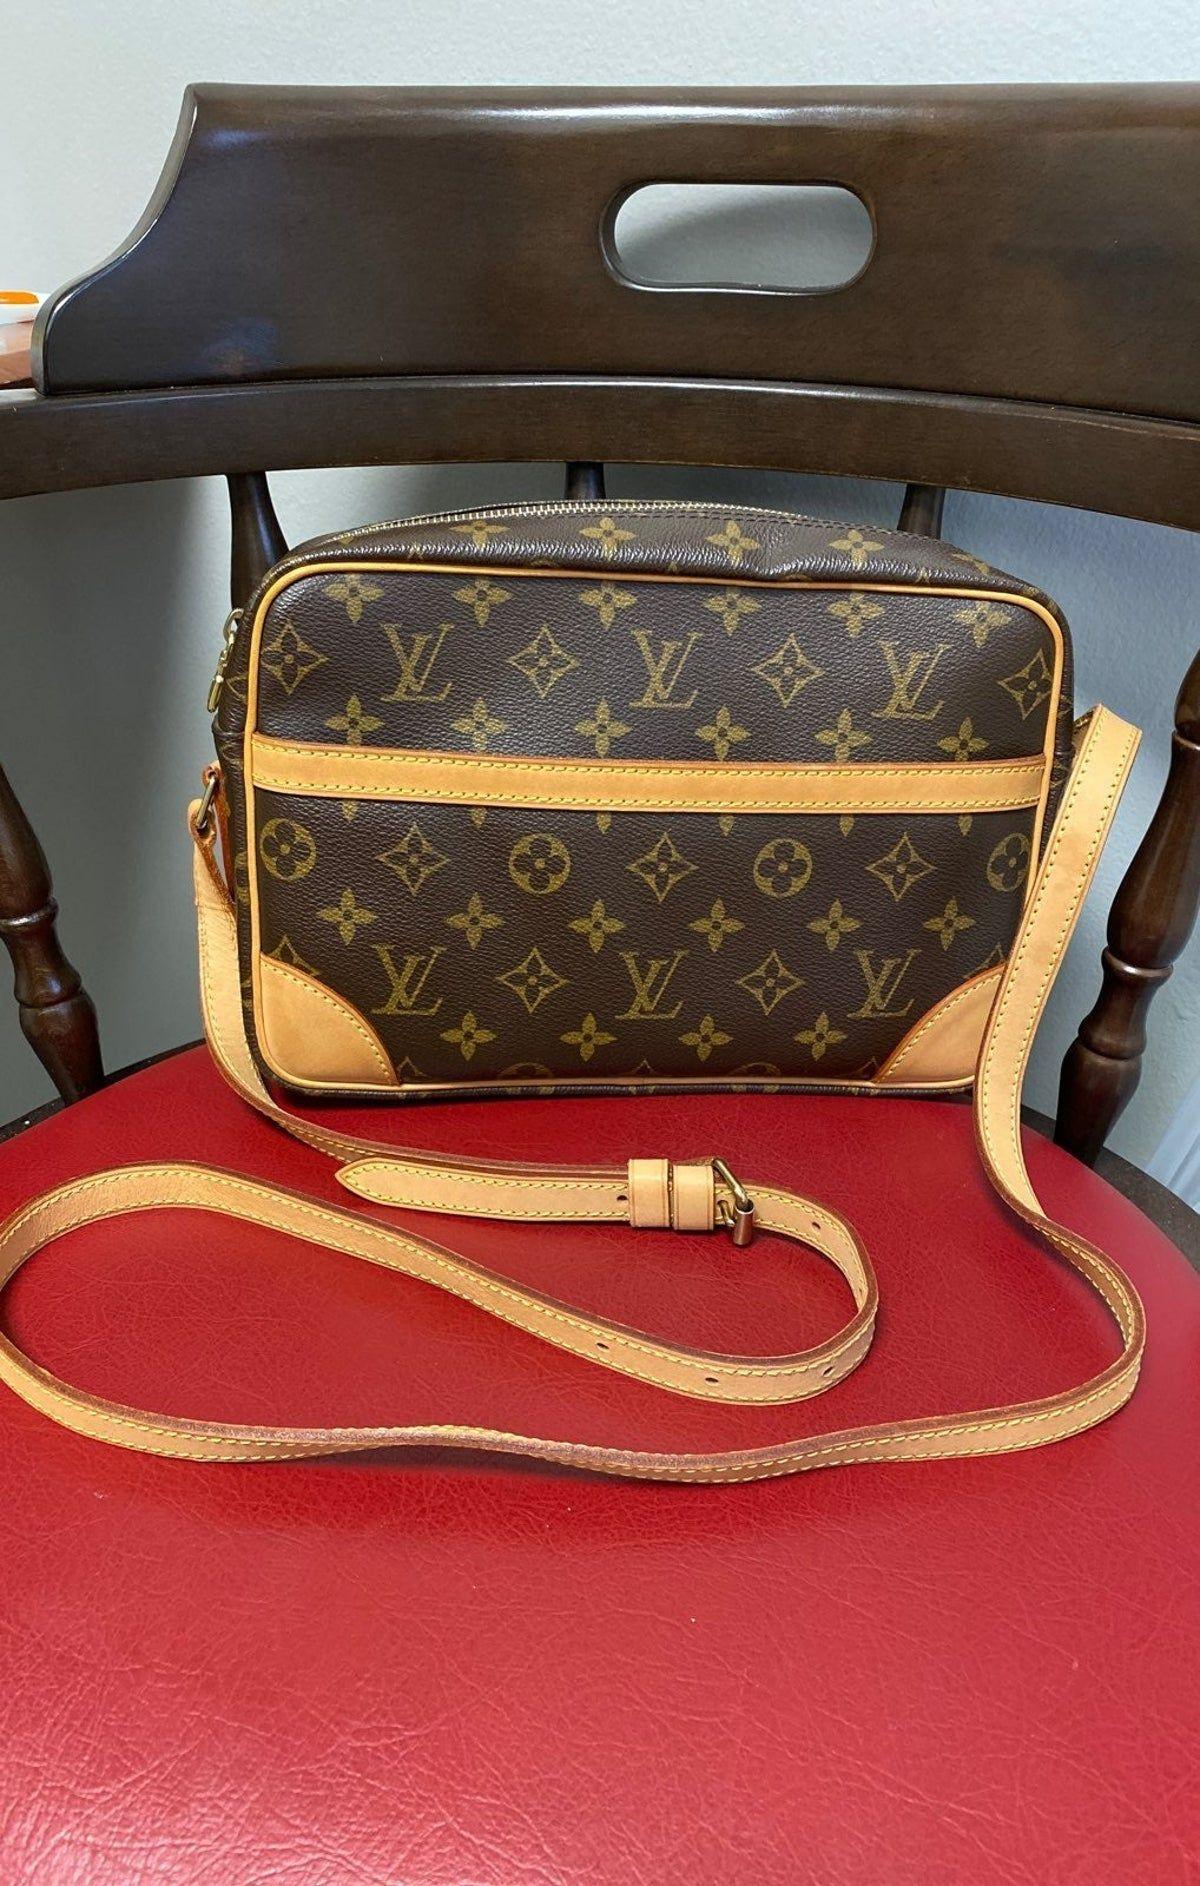 Louis Vuitton Trocadero 27 Crossbody Bag In 2020 Louis Vuitton Shoulder Bag Vuitton Louis Vuitton